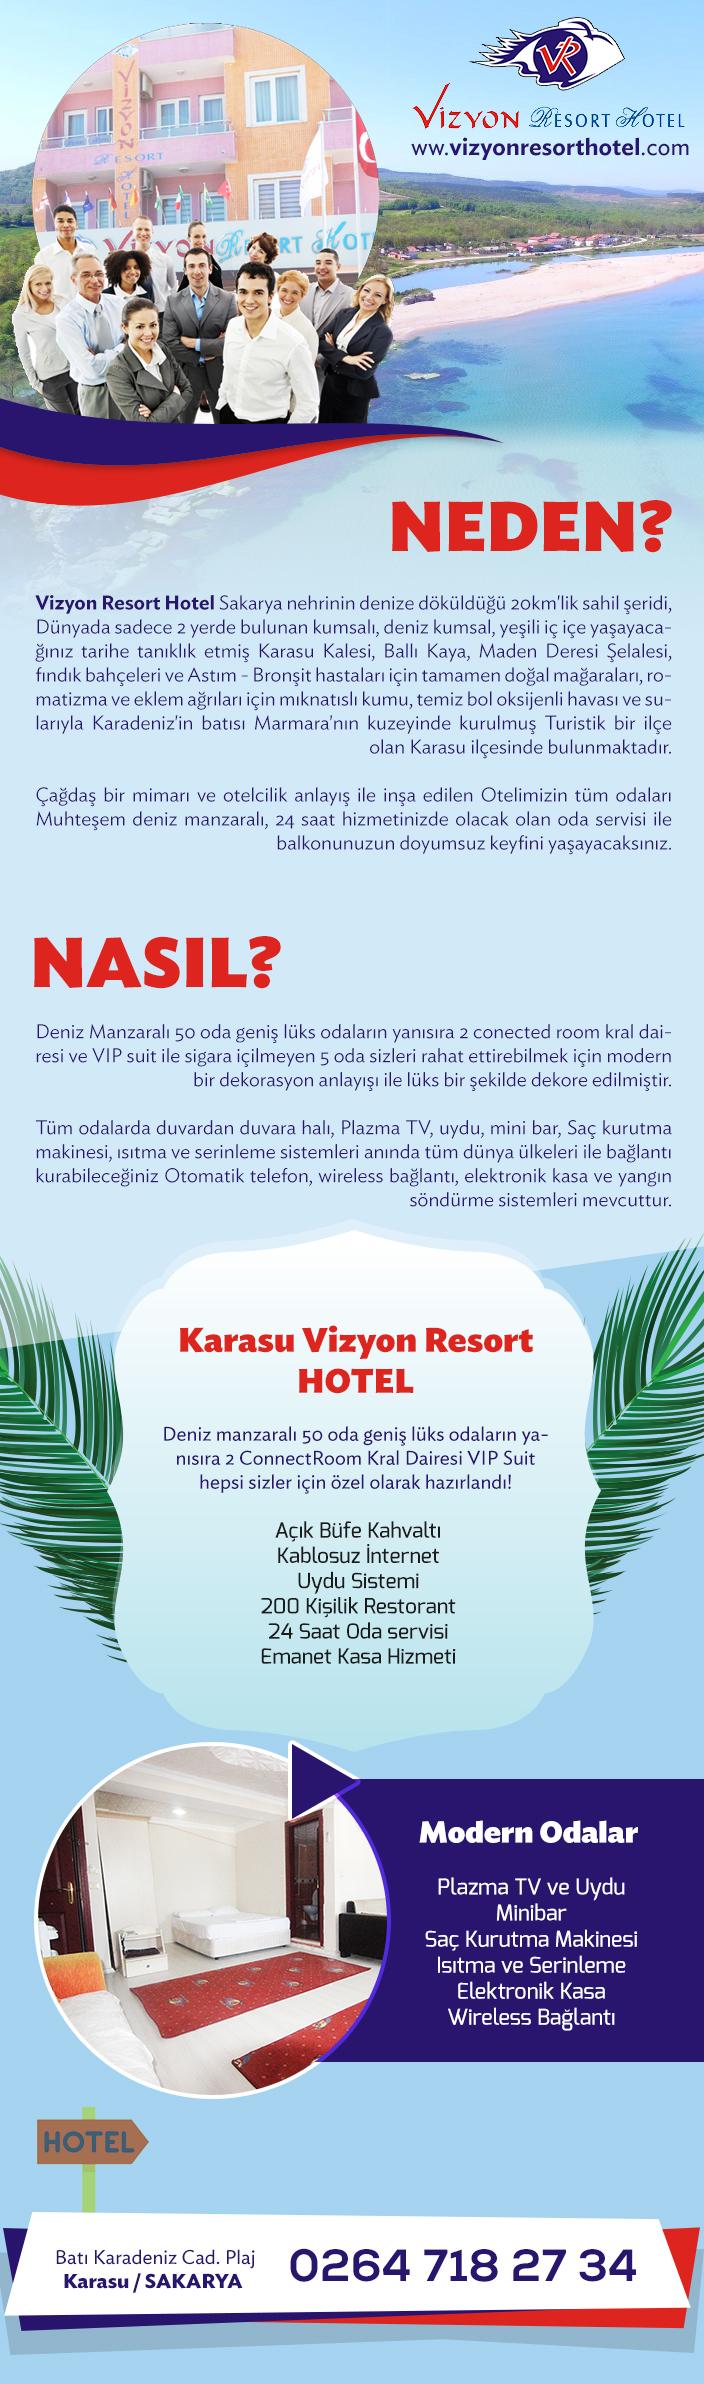 Vizyon Resort Hotel